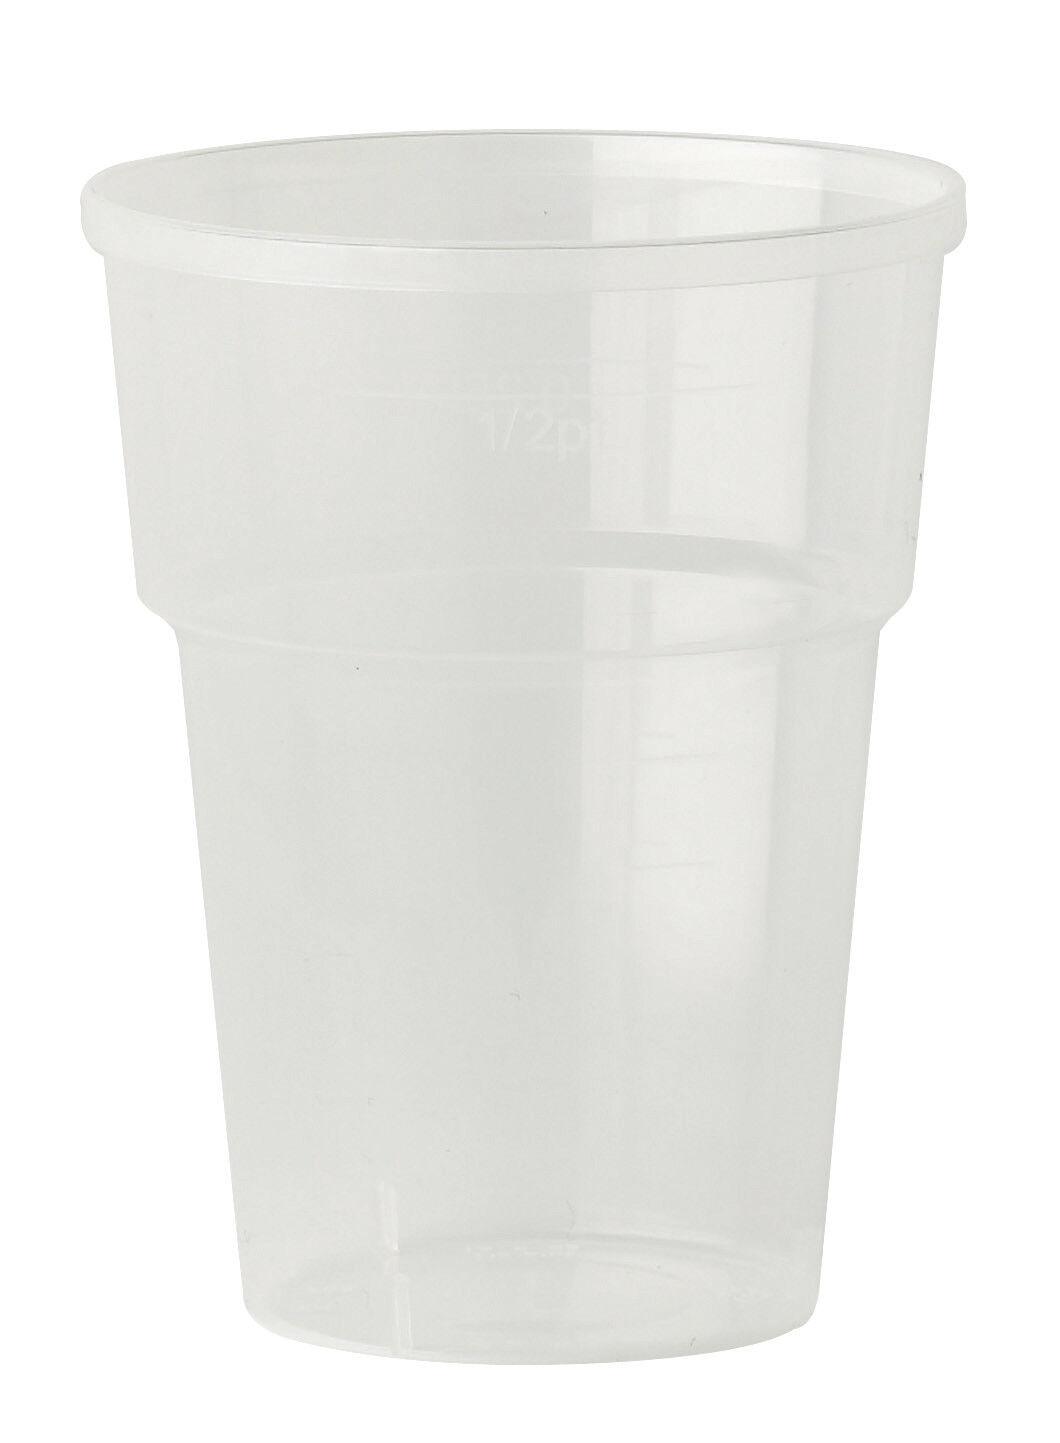 Katerglass jetables Pinte/Demi-Pinte Verres Gobelets durable marquage CE solide durable Gobelets b11a2d